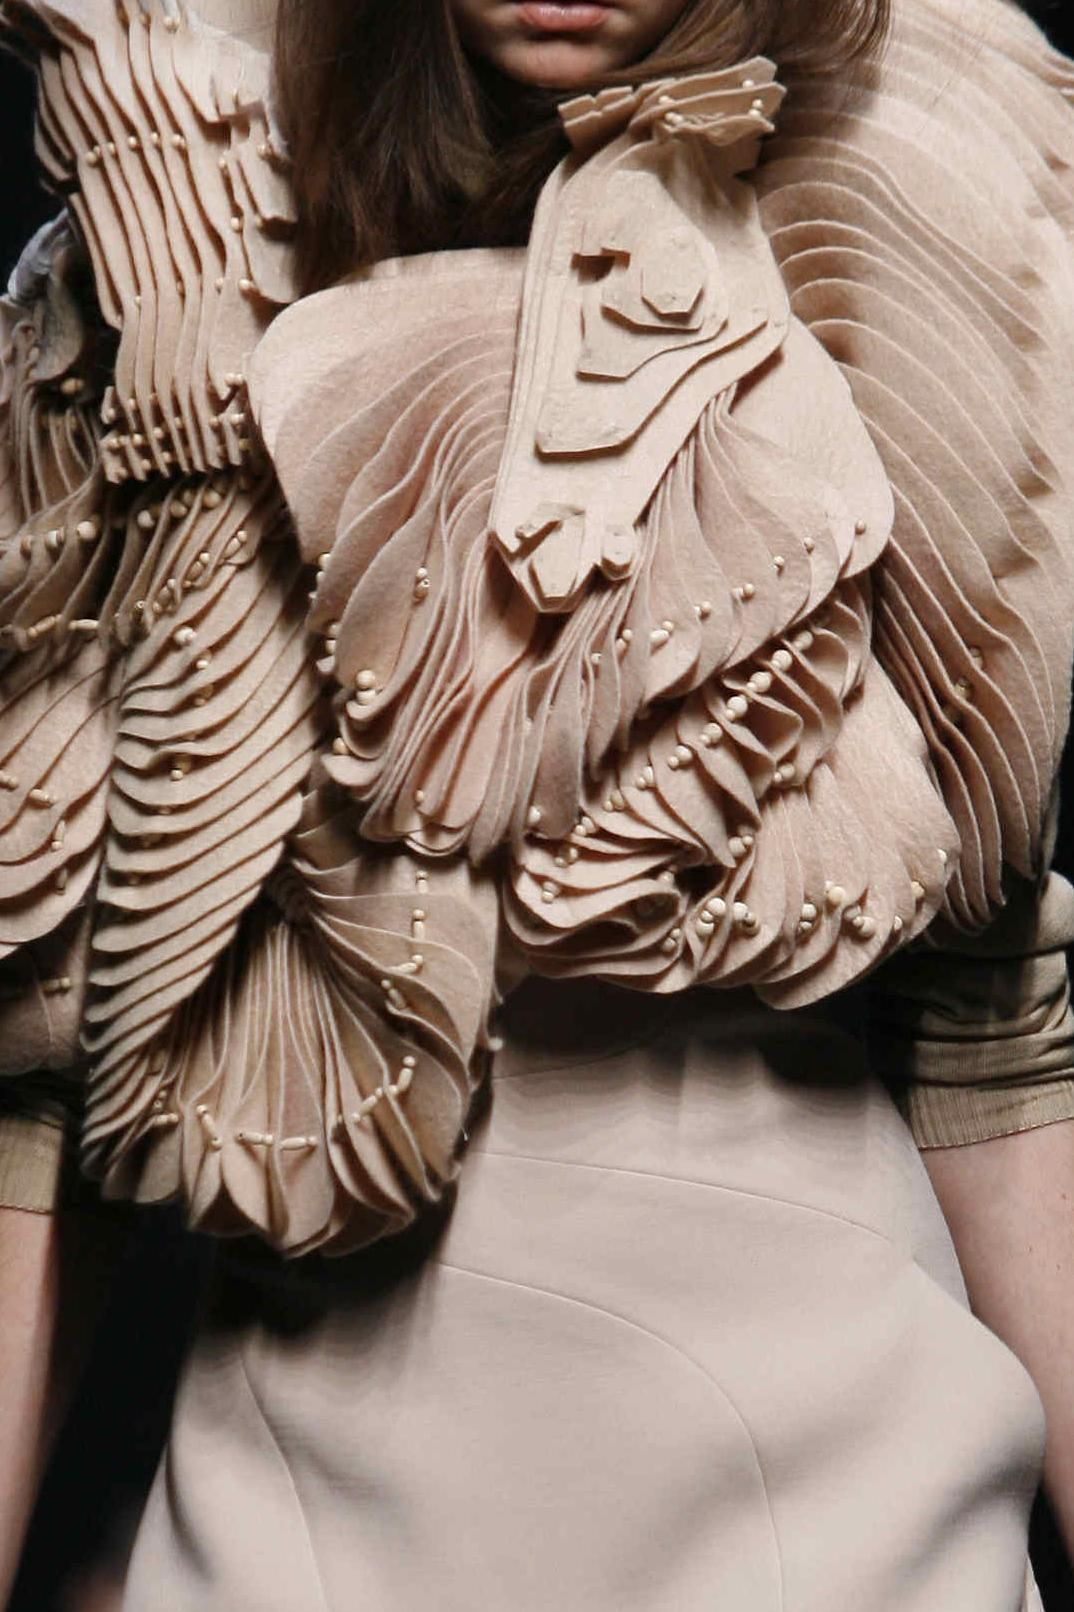 Givenchy AW06/07 - Beautiful fabric manipulation + texture.